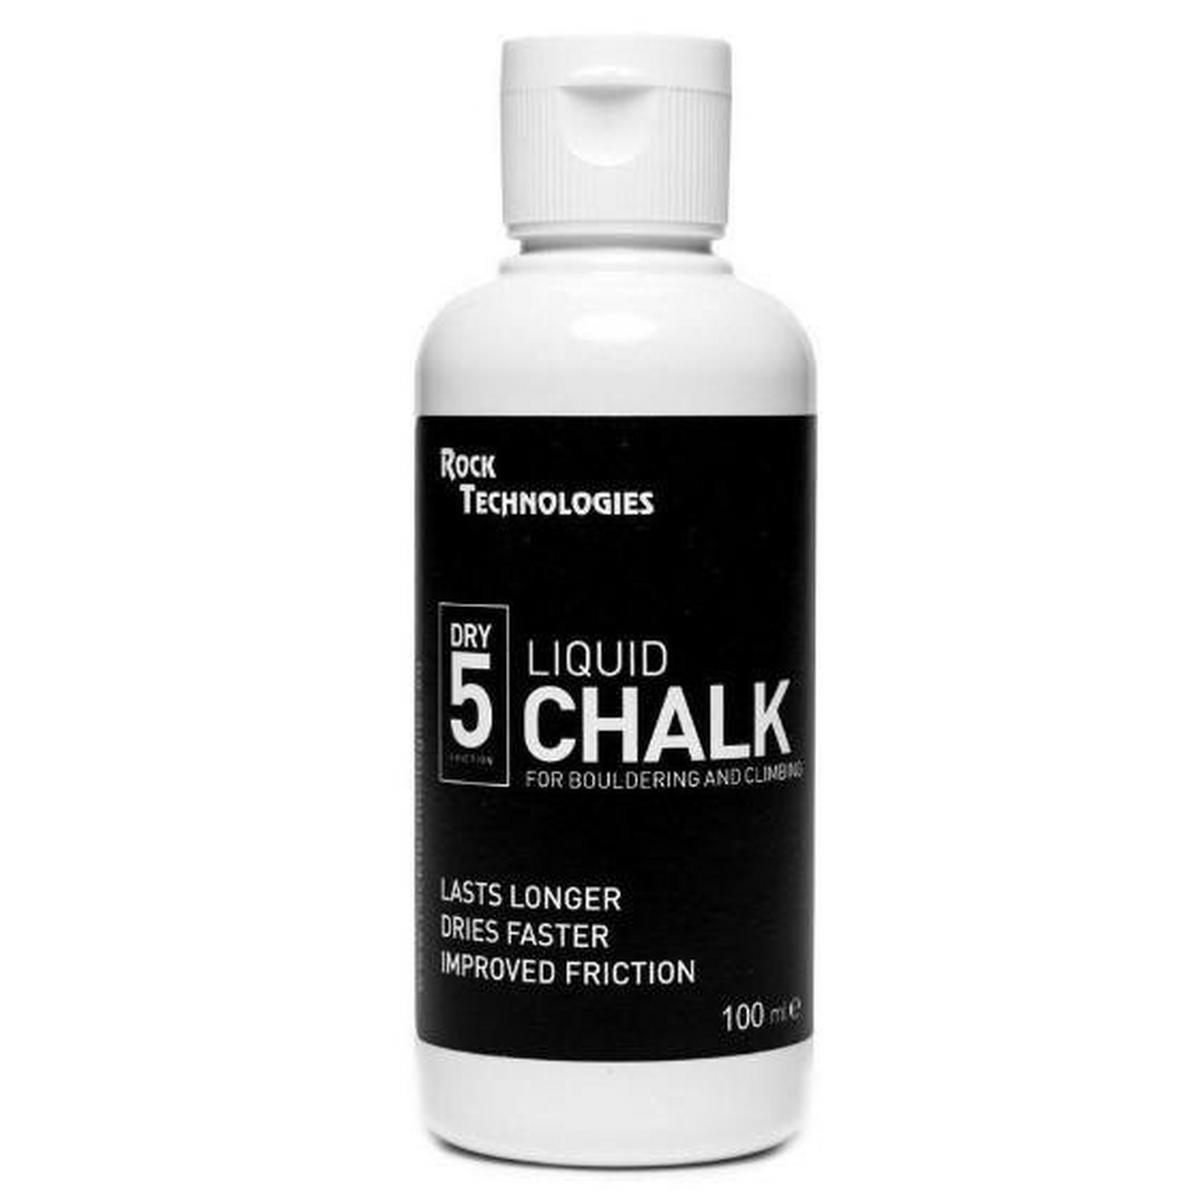 Rock Technology Dry 5 Liquid Chalk 100ml - White